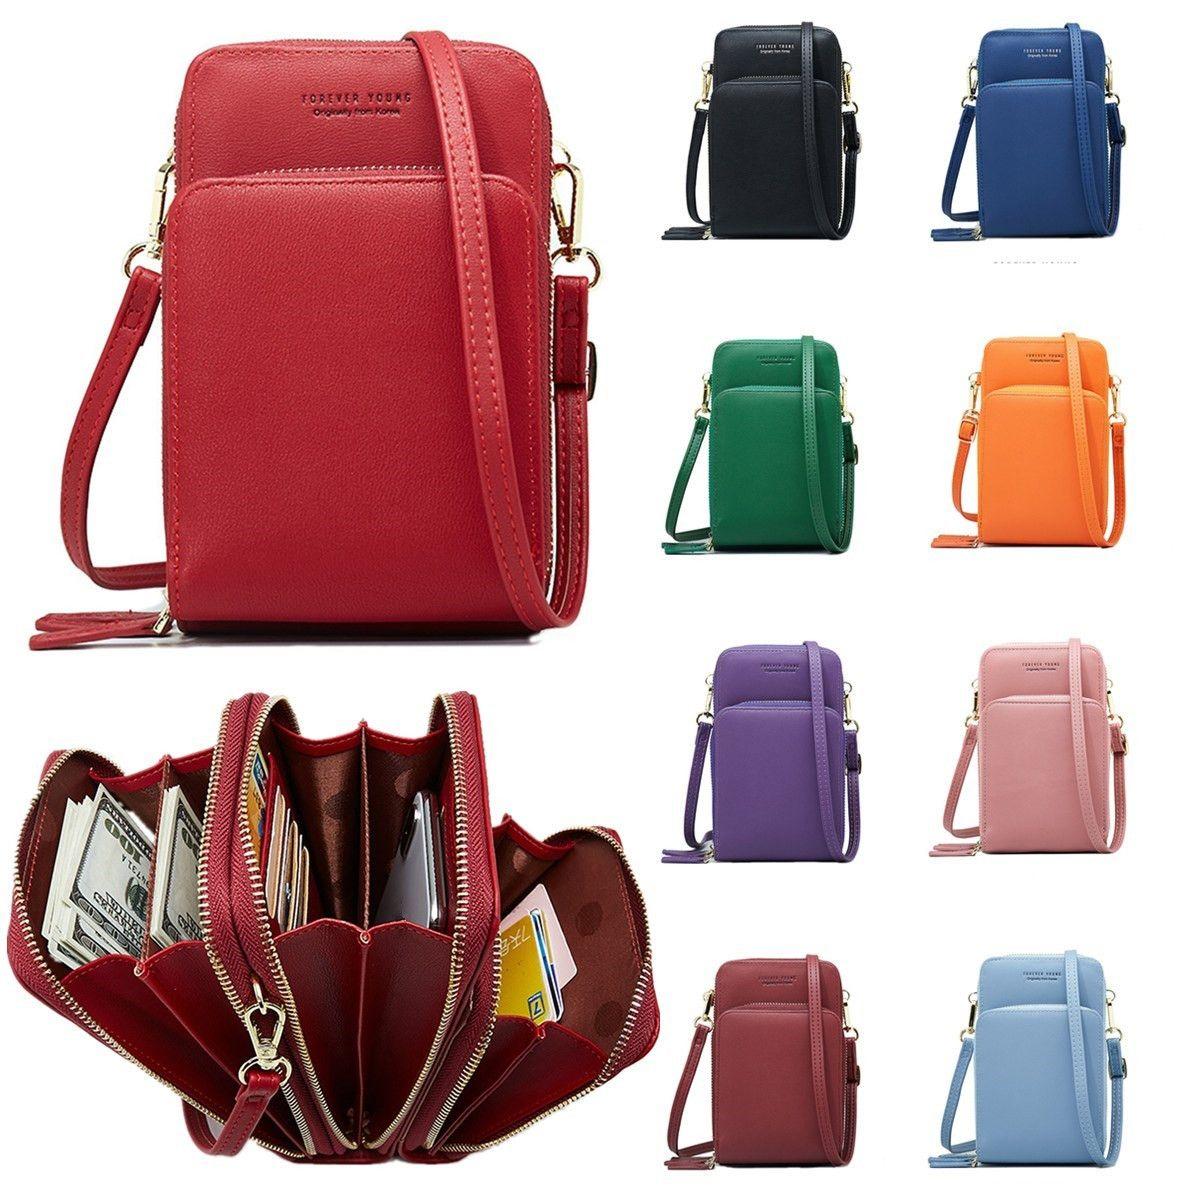 Small Cellphone Bag Mobile Phone Mini Bags Small Clutches Shoulder Bag Leather Women Handbag Clutch Purse Handbag Flap 10 color